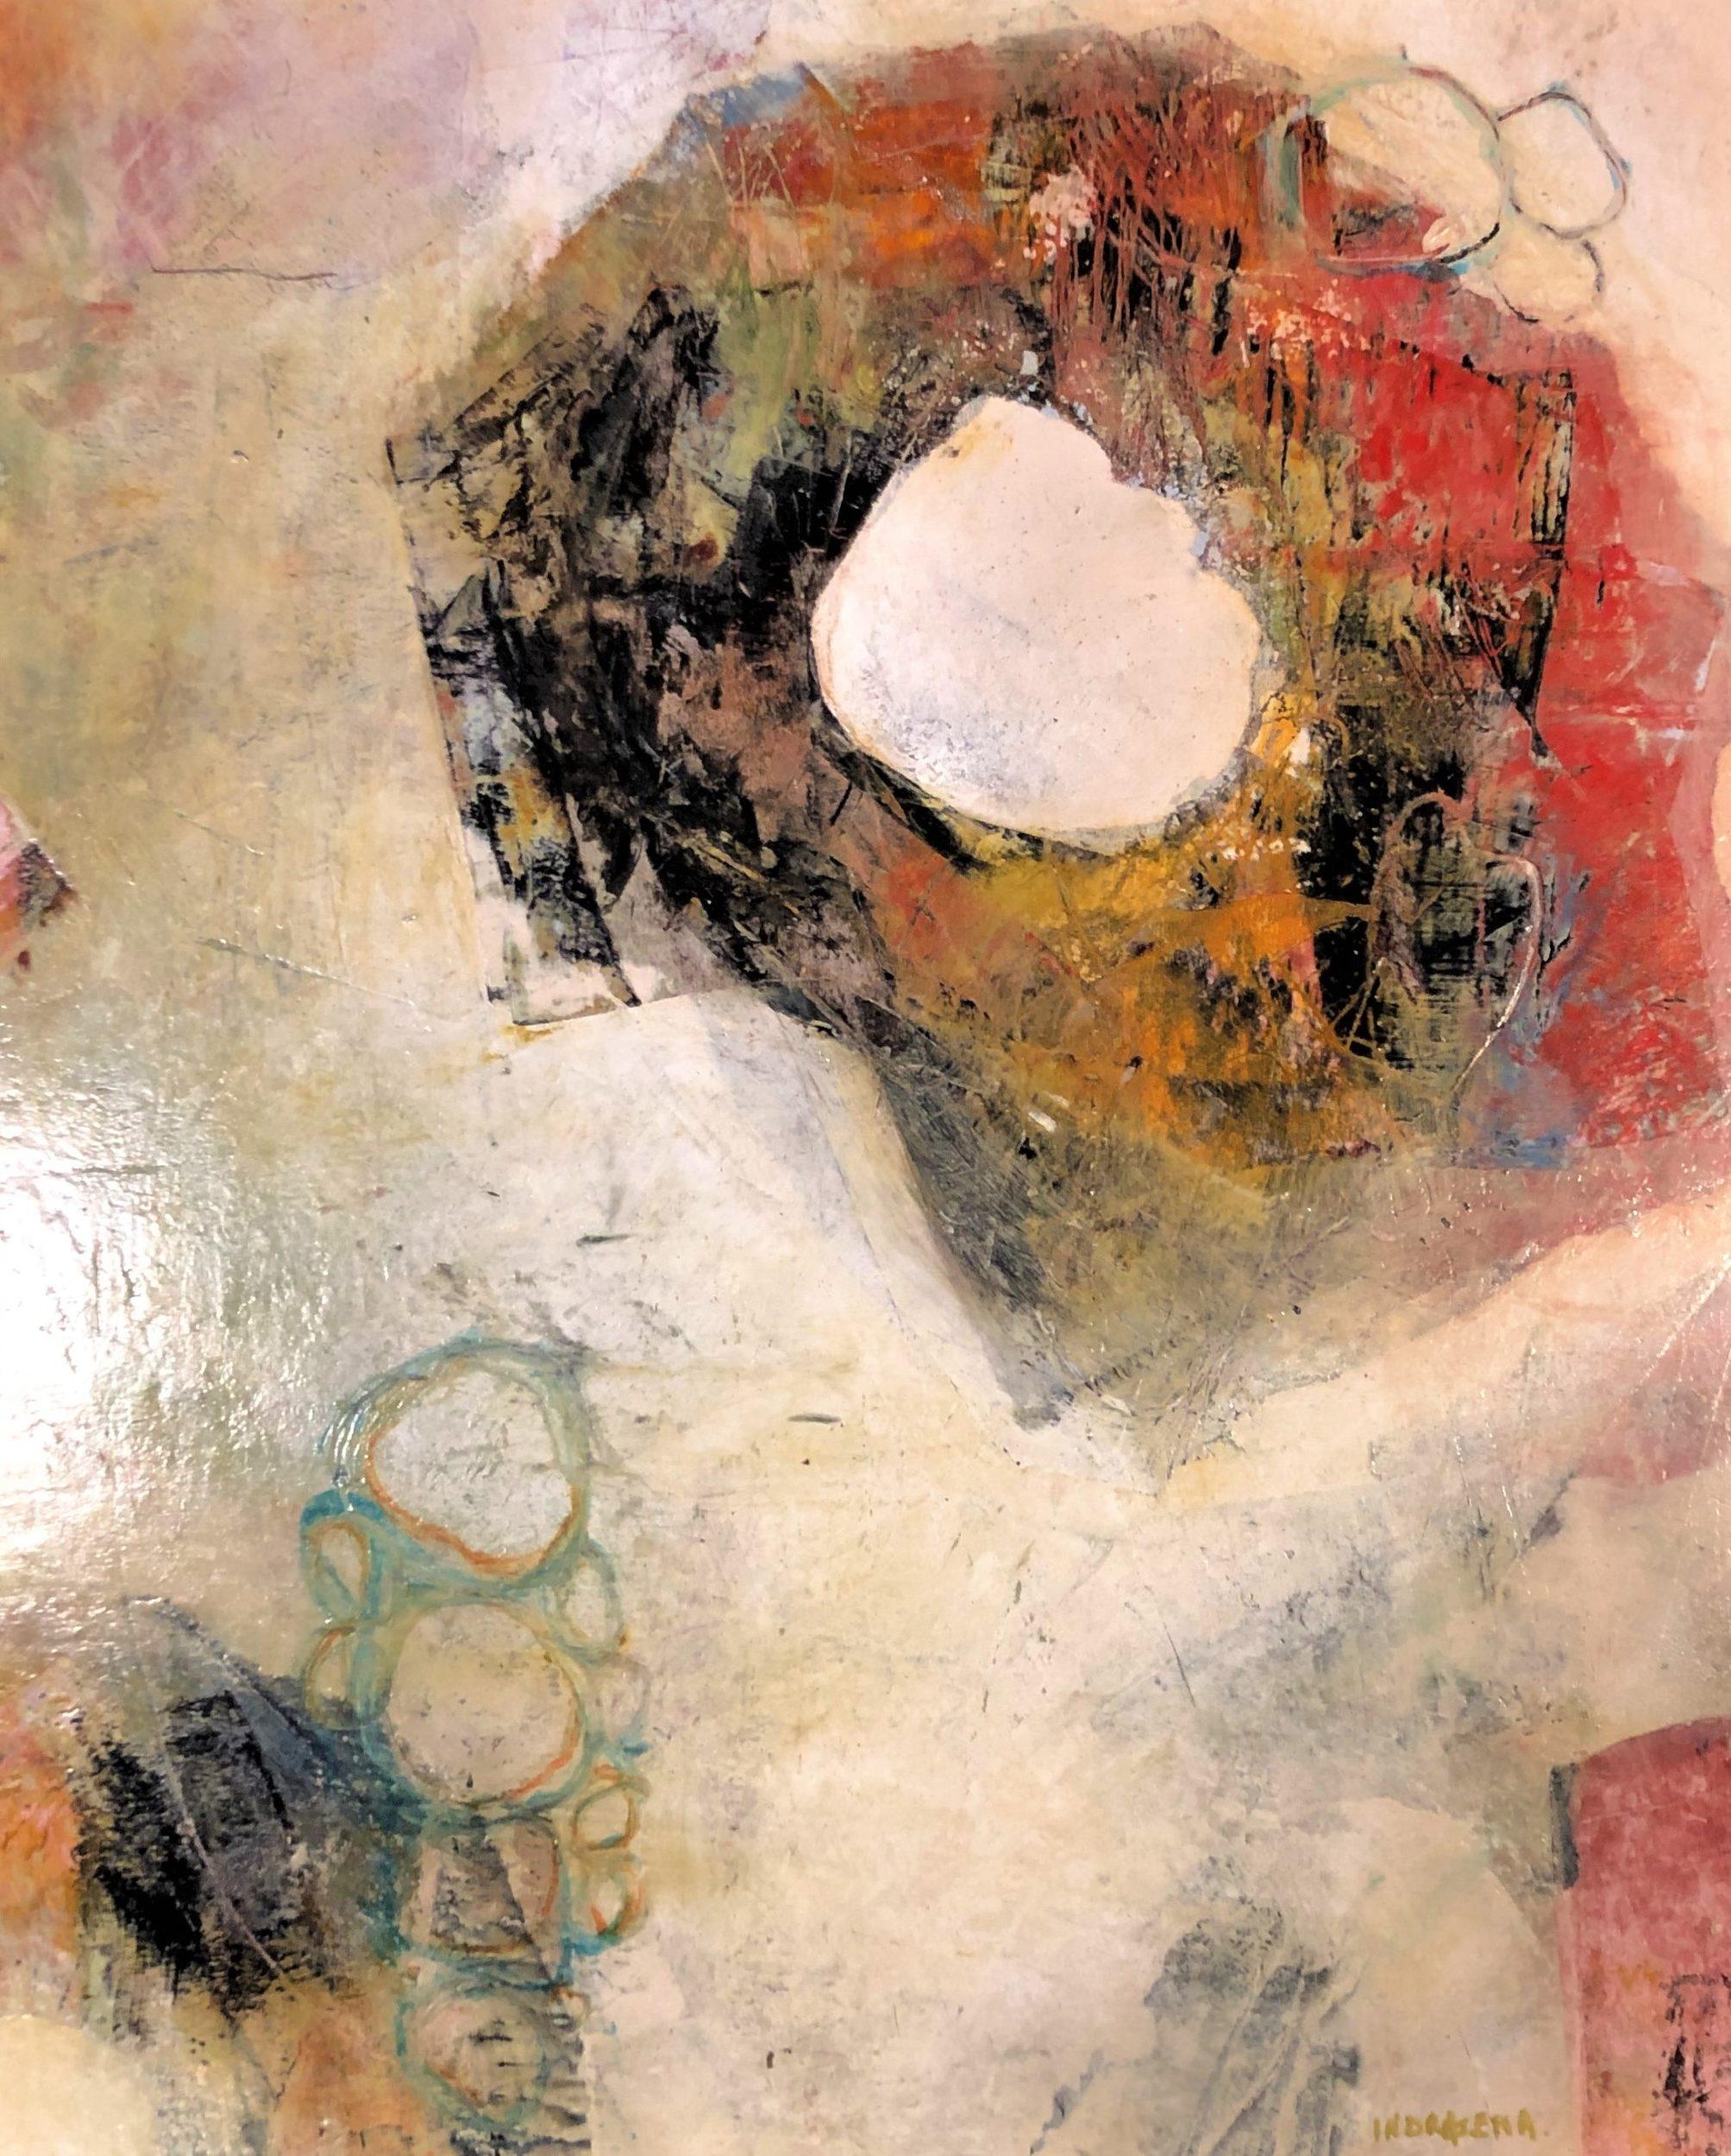 Hallucinations I 40 x 50 Cold Wax & Oil